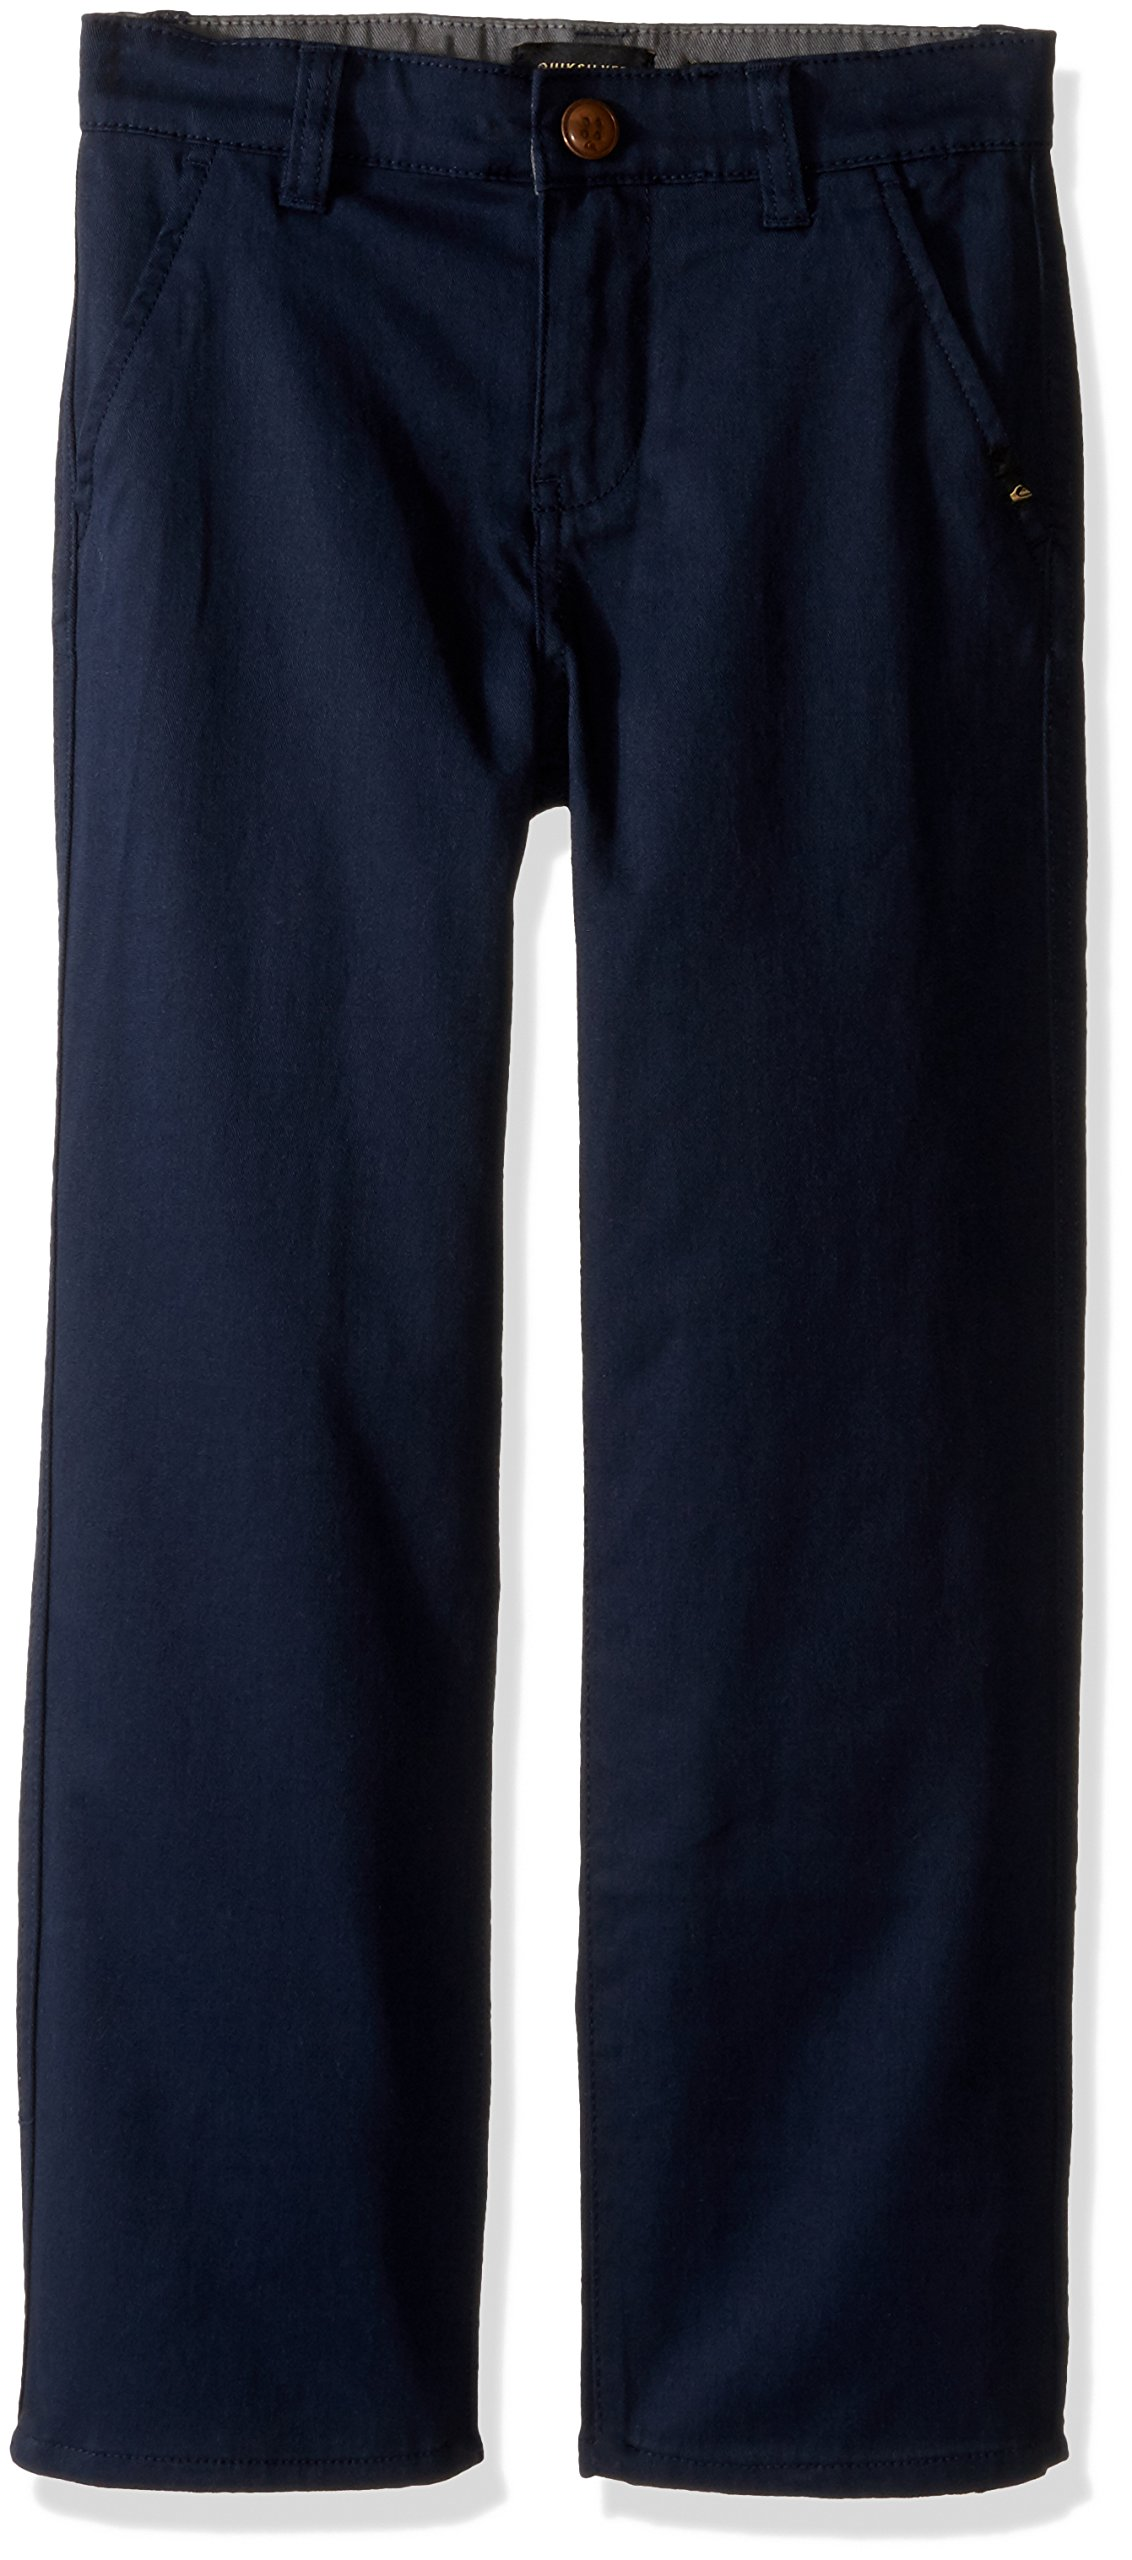 Quiksilver Little Boys' Toddler Everyday Union Pant Aw Non-Denim Pant, Navy Blazer, 2T